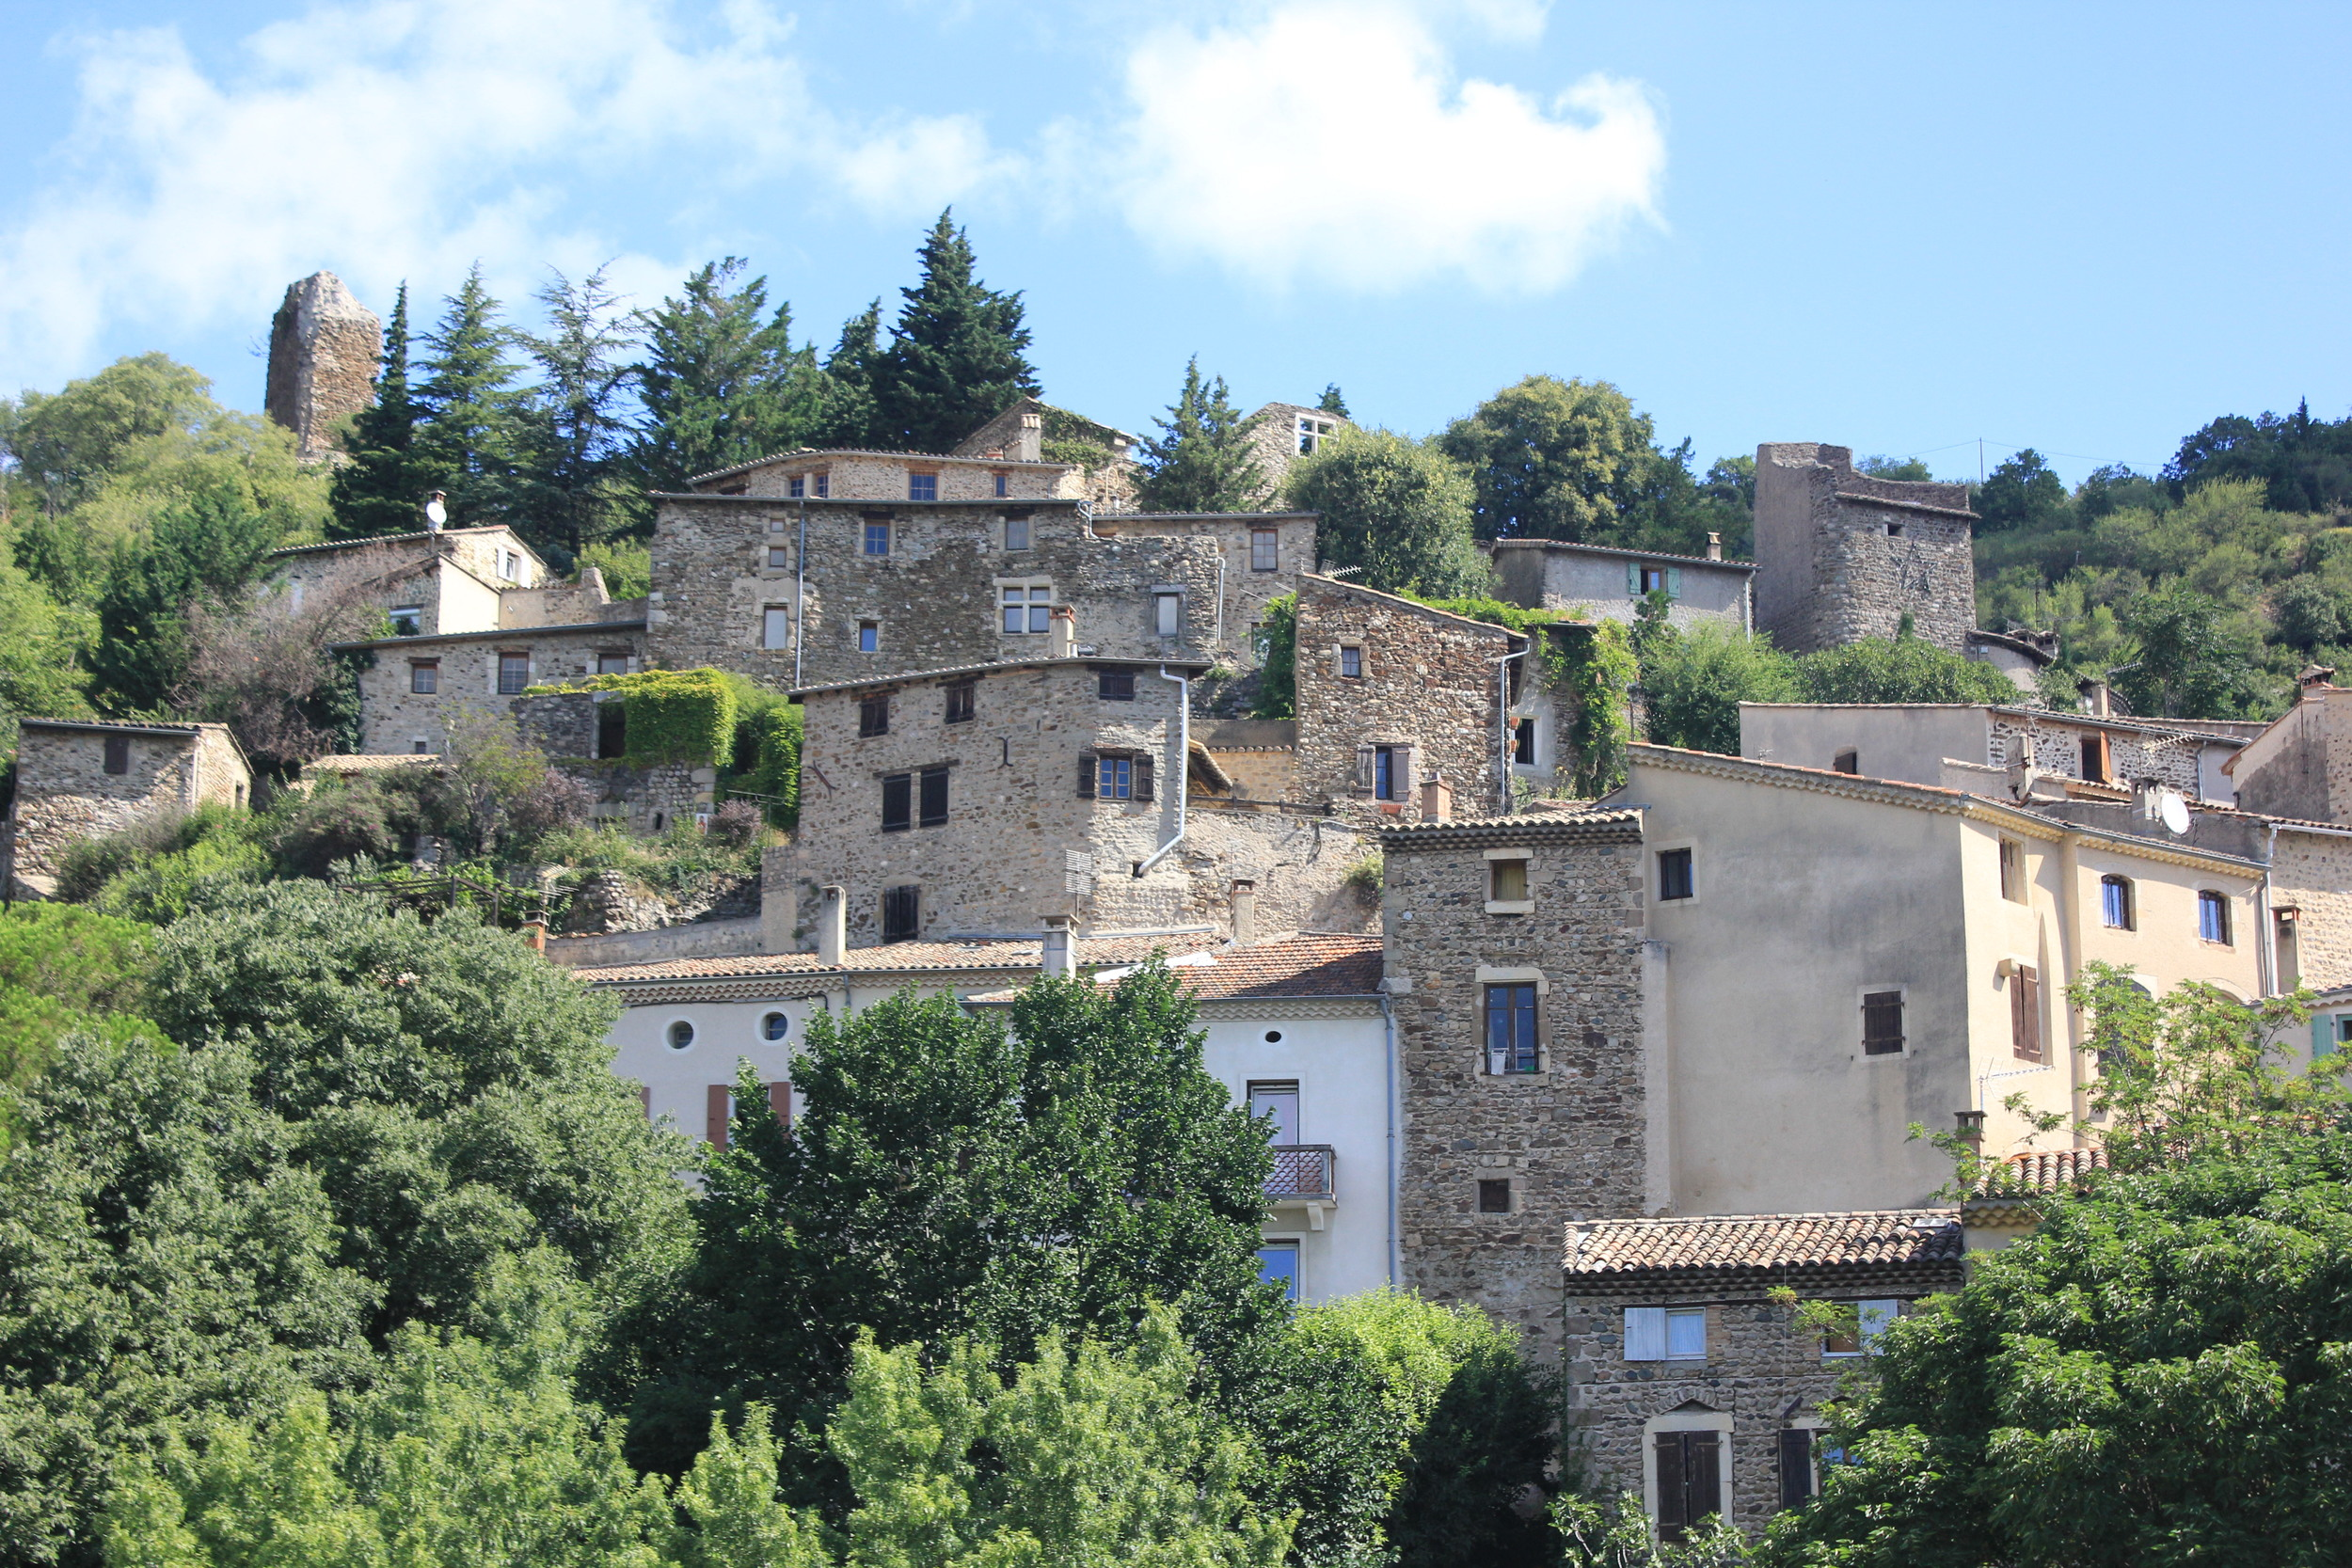 The Medieval village of Beauchastel